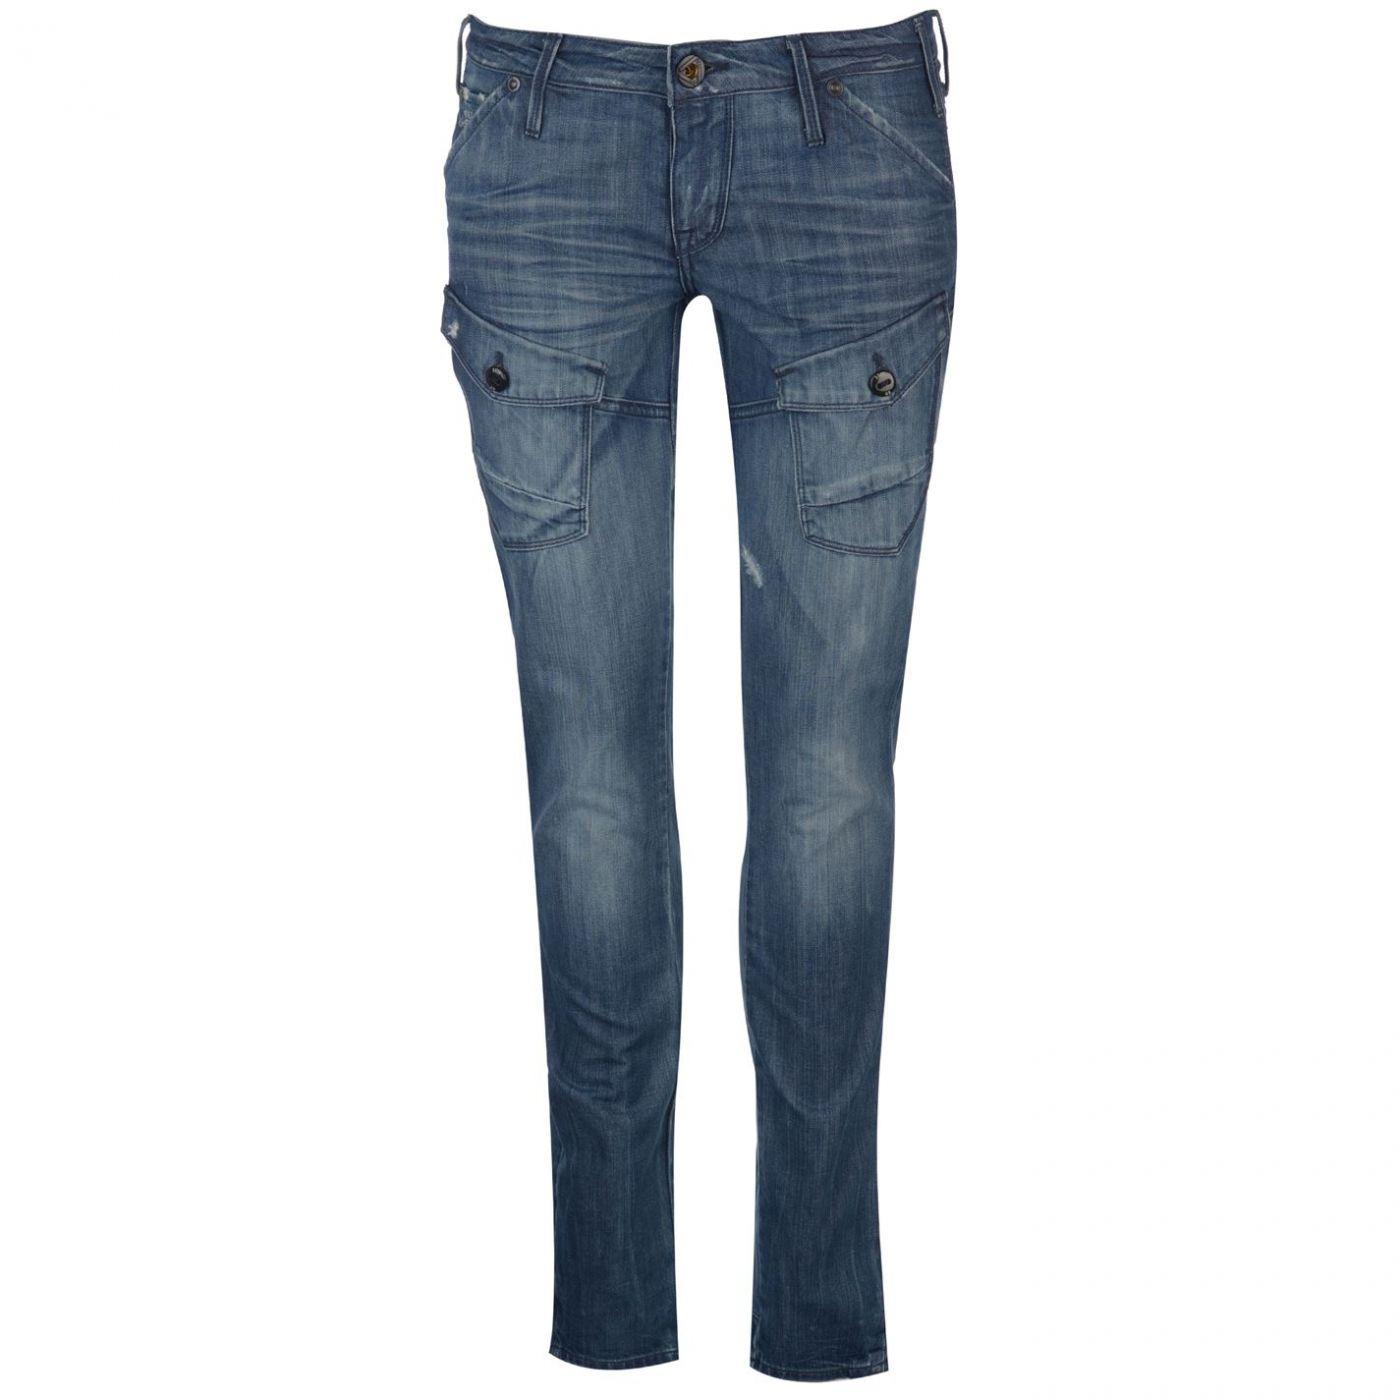 G Star 60289 Jeans